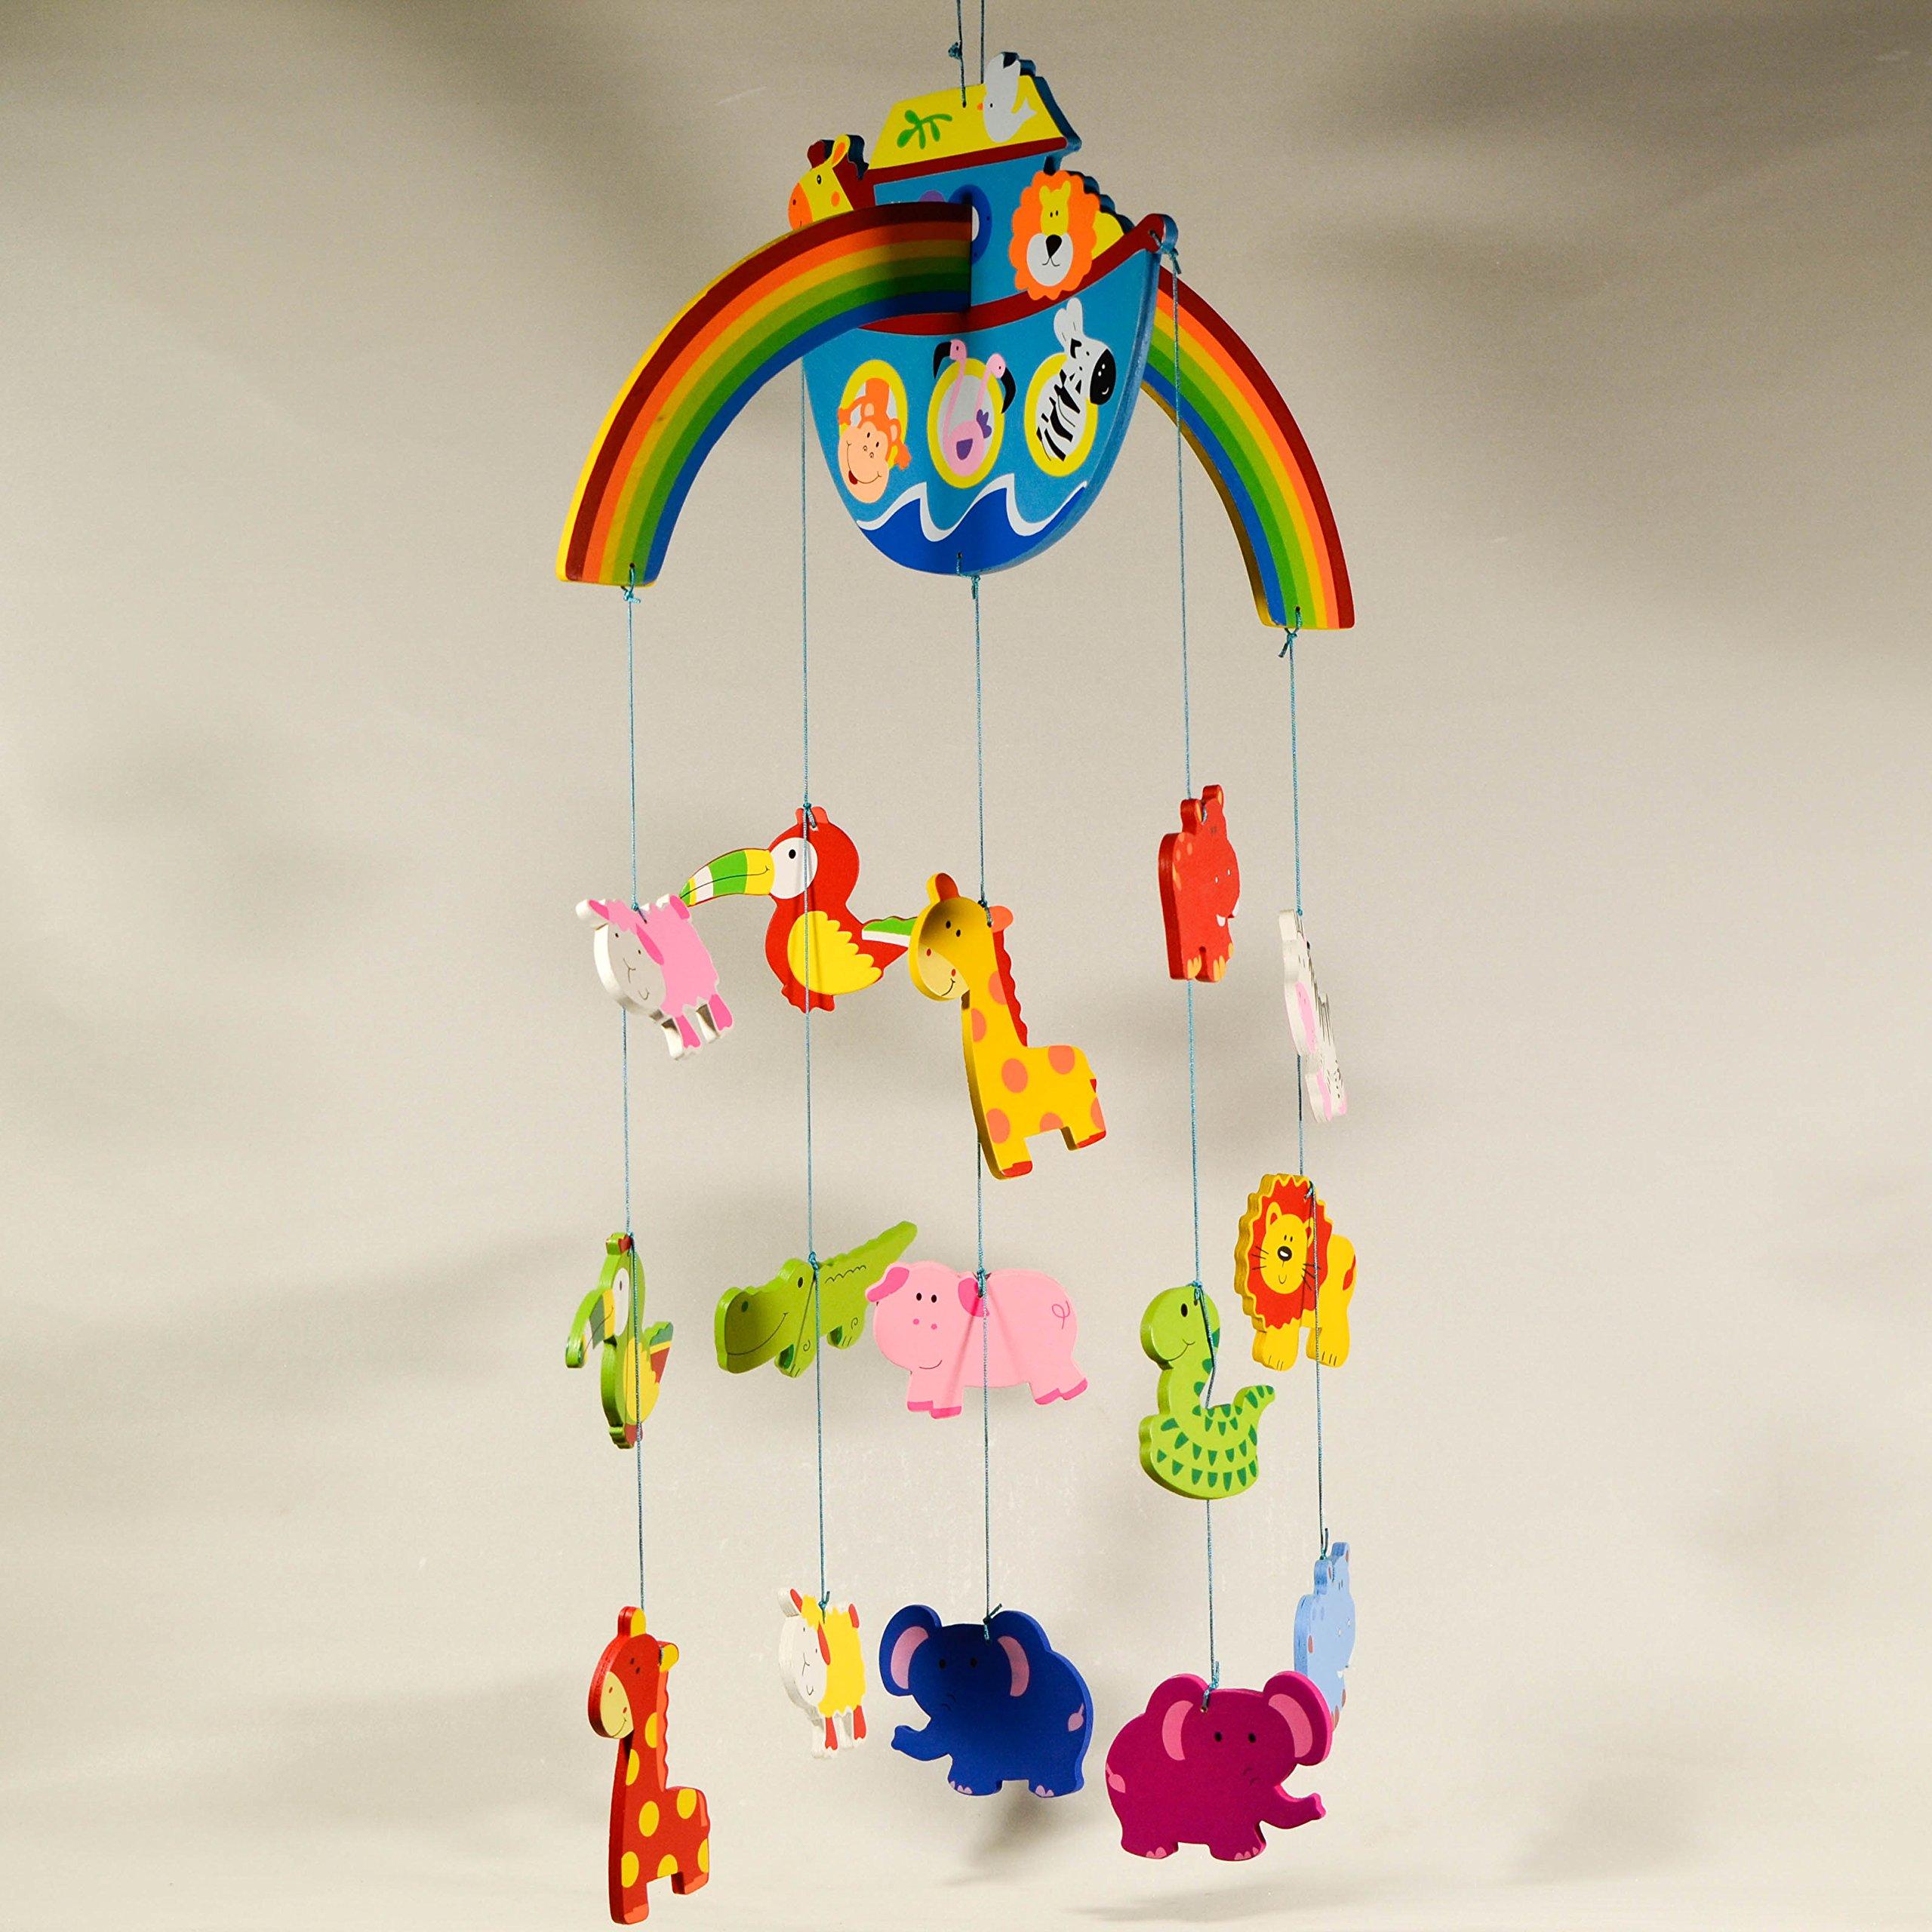 Noah's Ark Wooden Hanging Mobile - Nursery Decor - Animal Mobile Ornament - Baby Room Decor